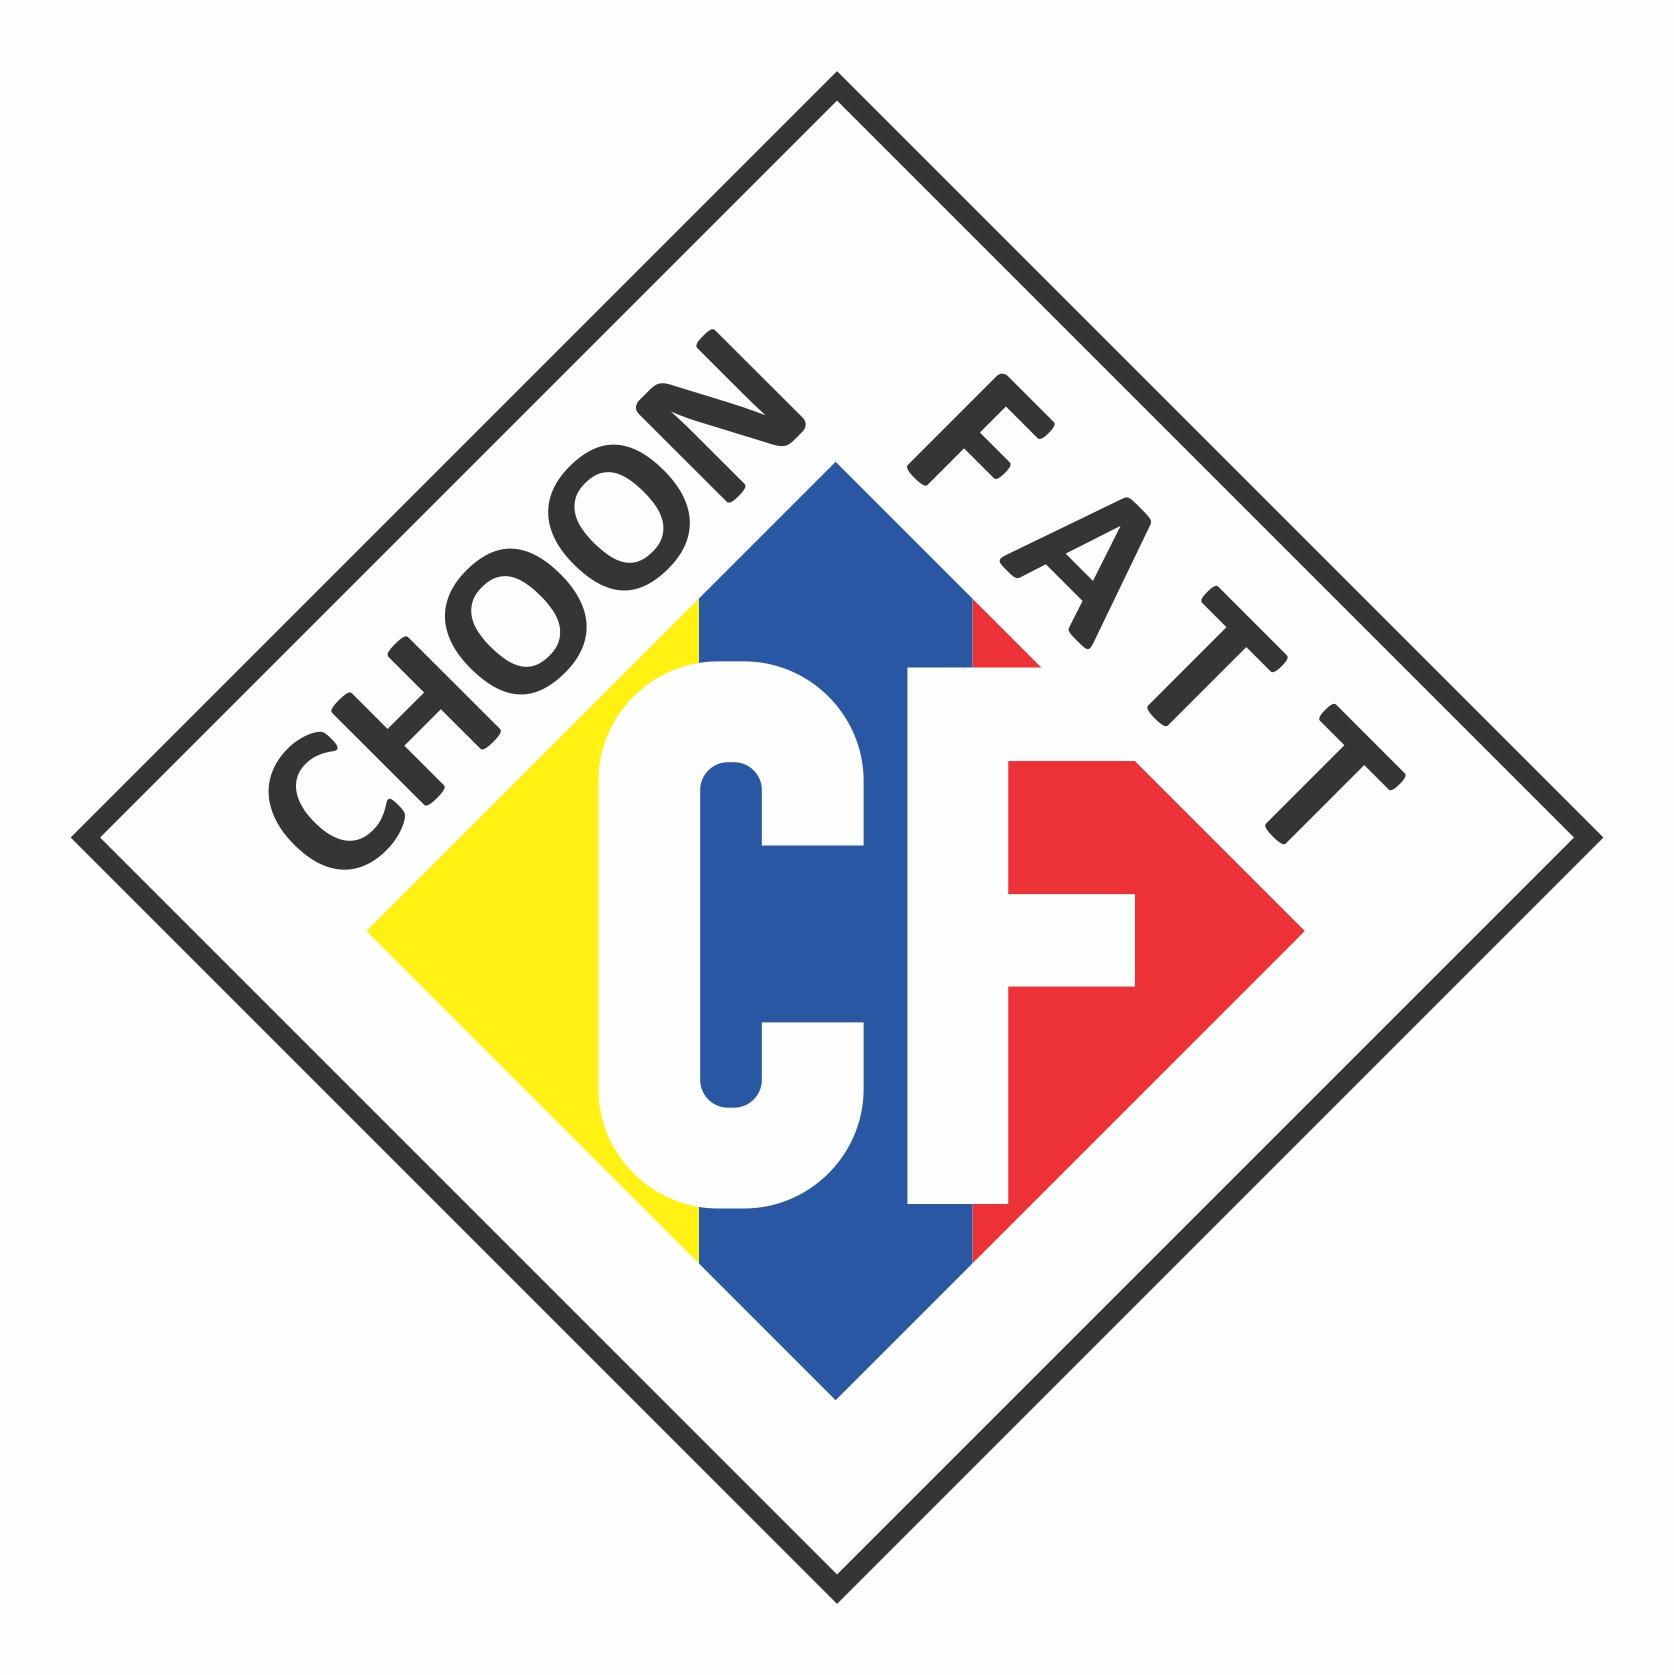 Choon Fatt Sauce Factory Sdn Bhd